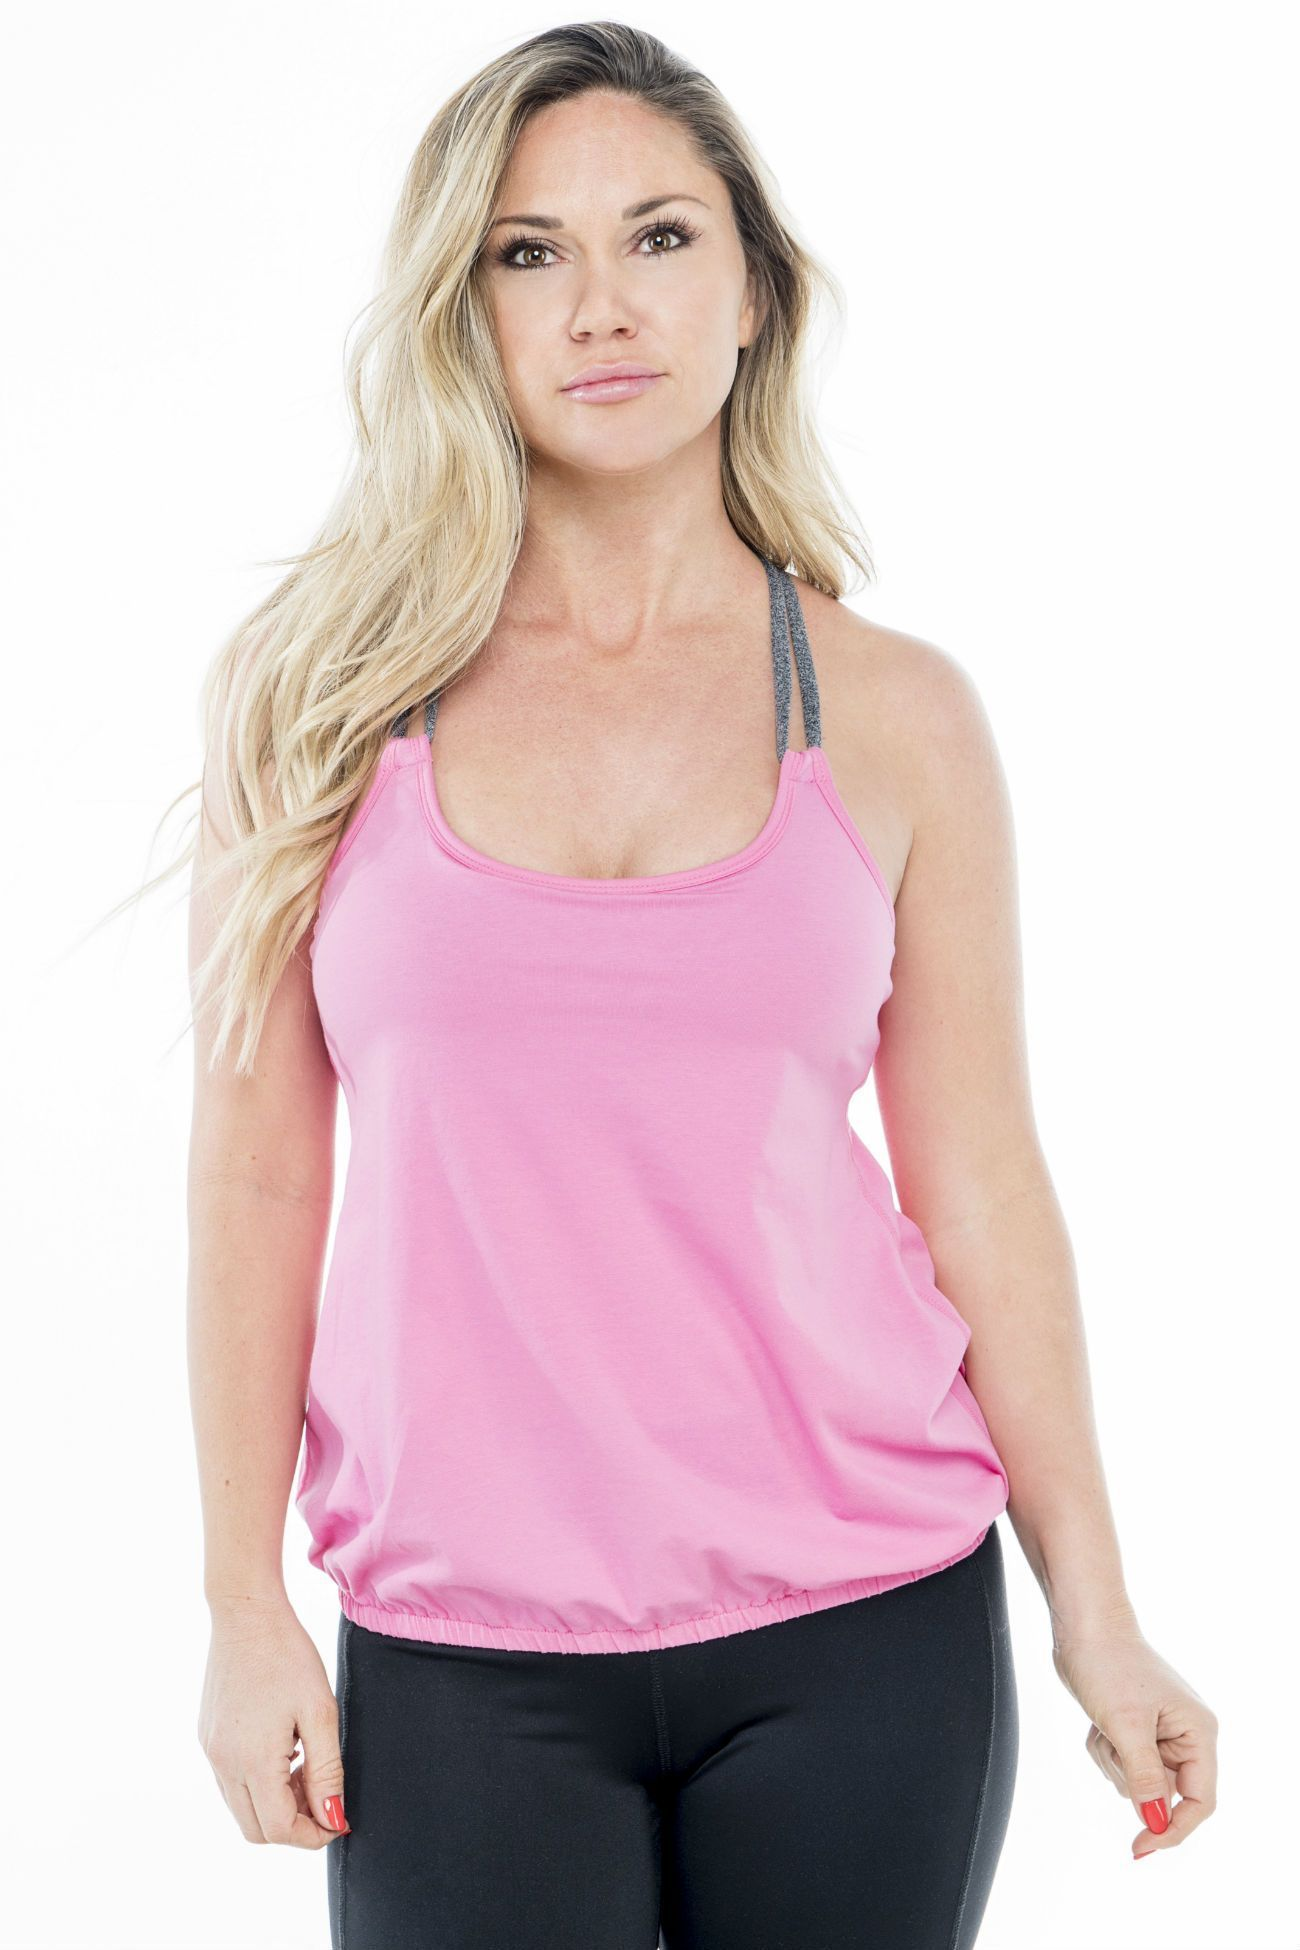 MFF Cross Back Tank Pink Supportive sports bras, Fashion